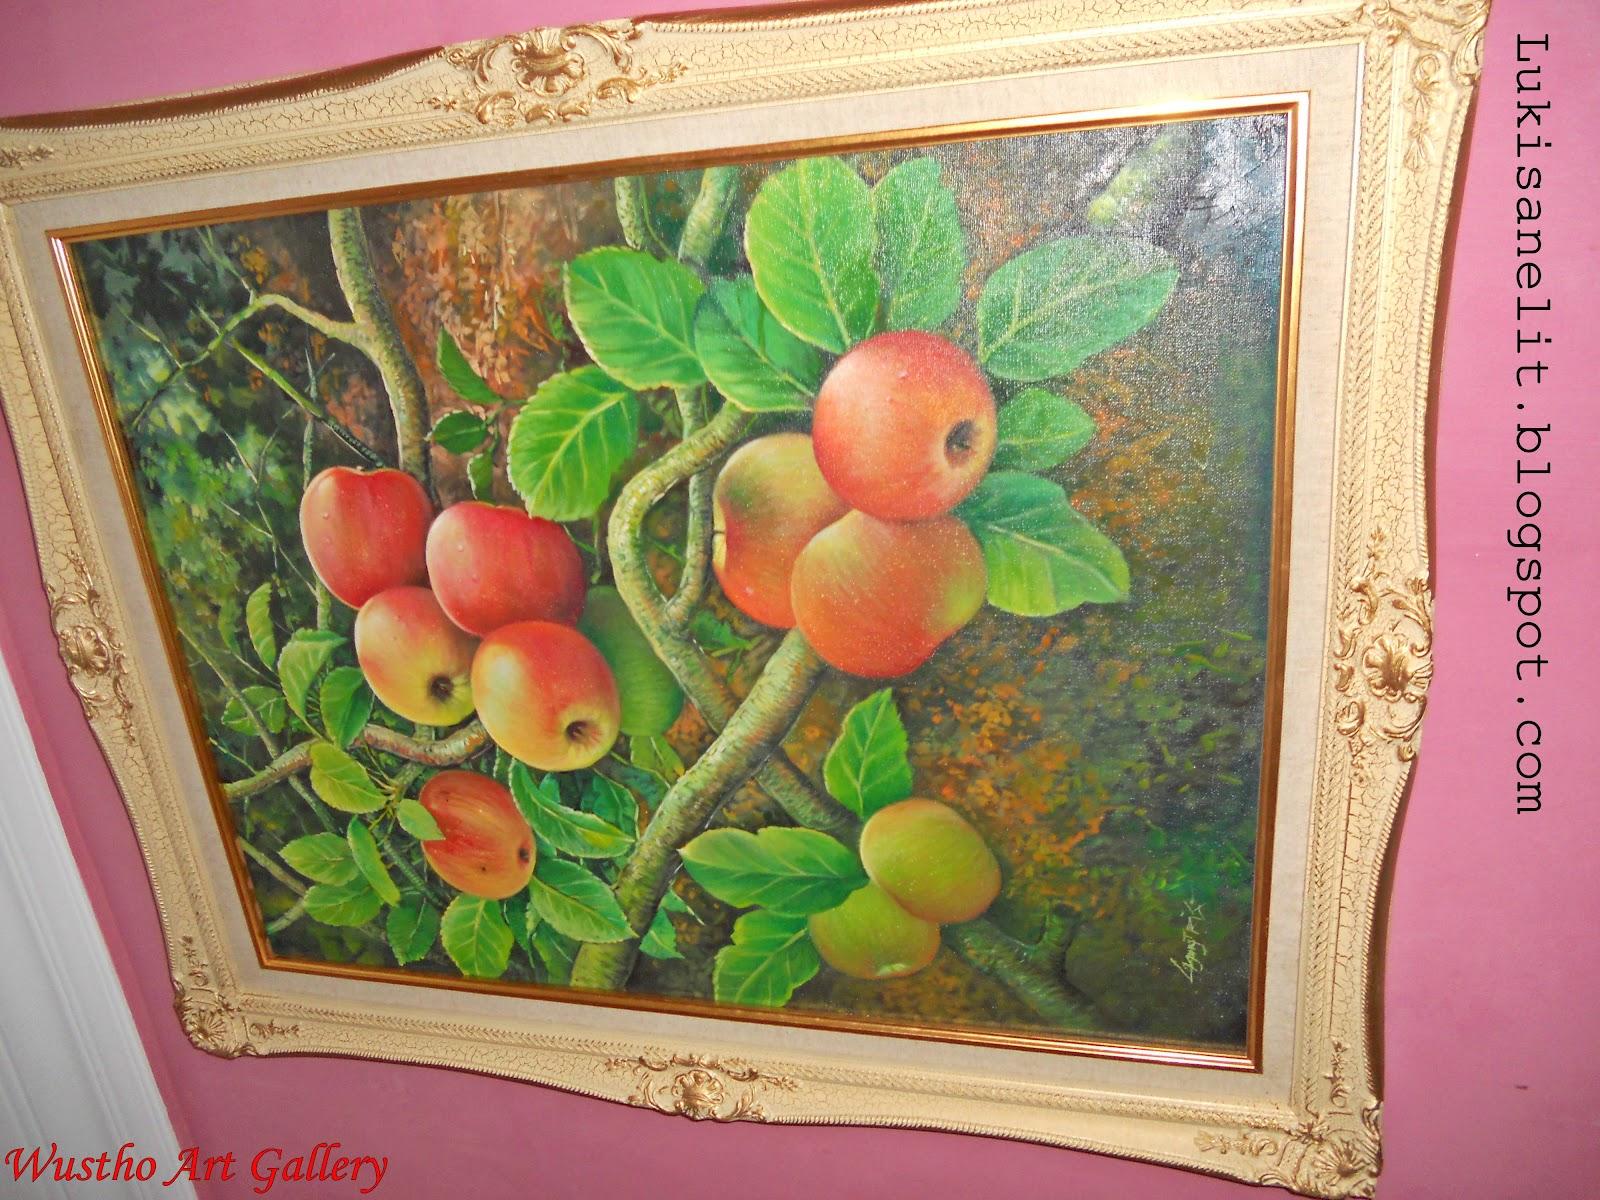 ... Buah http://lukisanelit.blogspot.com/2012/02/lukisan-buah-apel.html